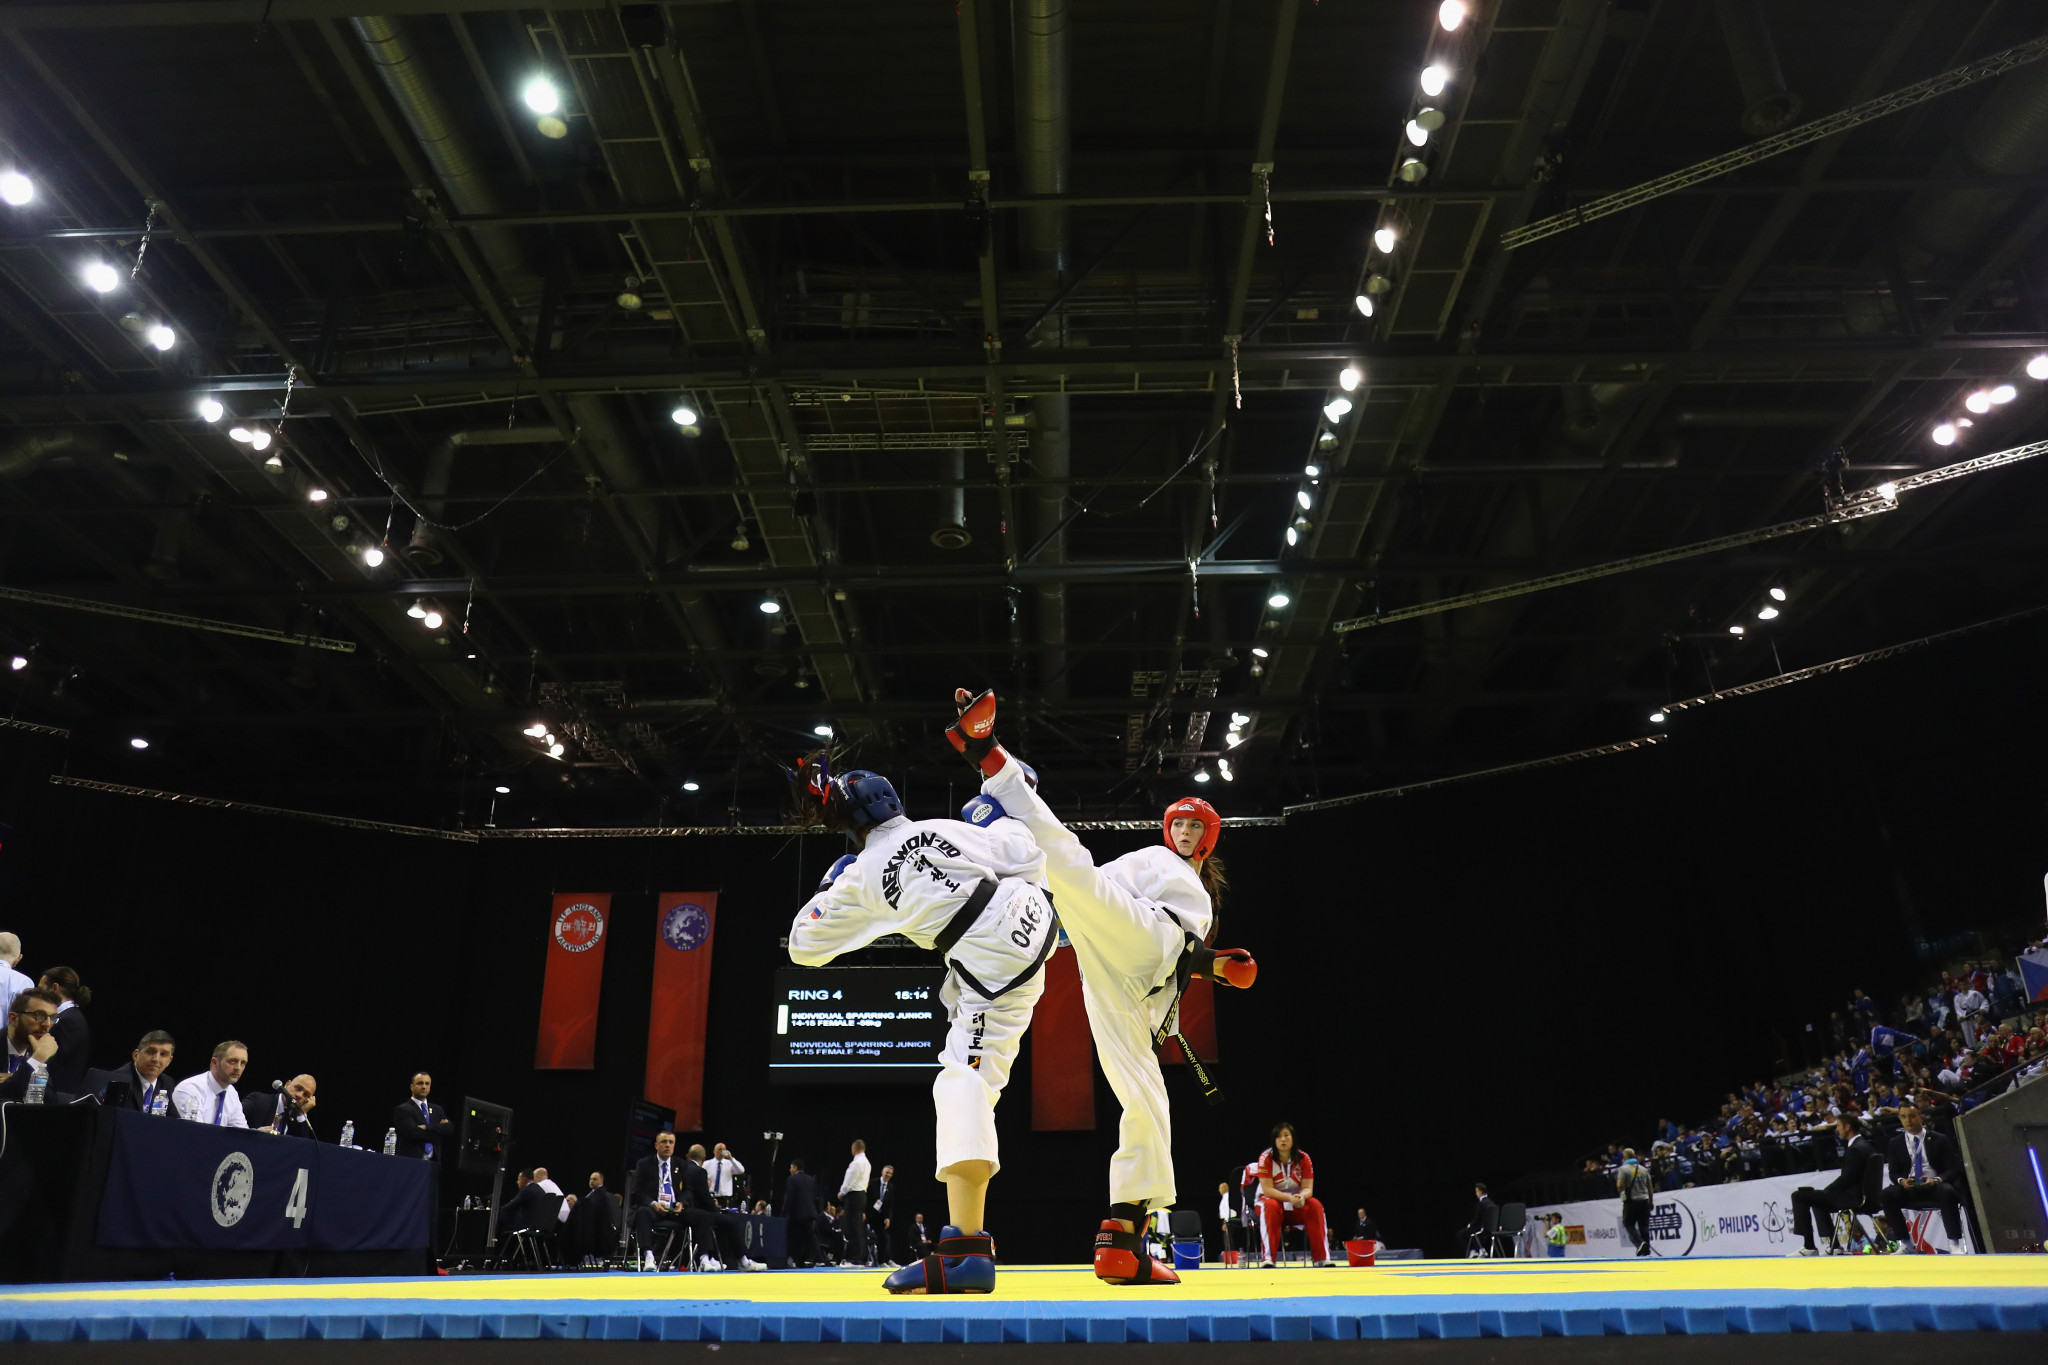 World Taekwondo celebrate after study shows positive impact of events